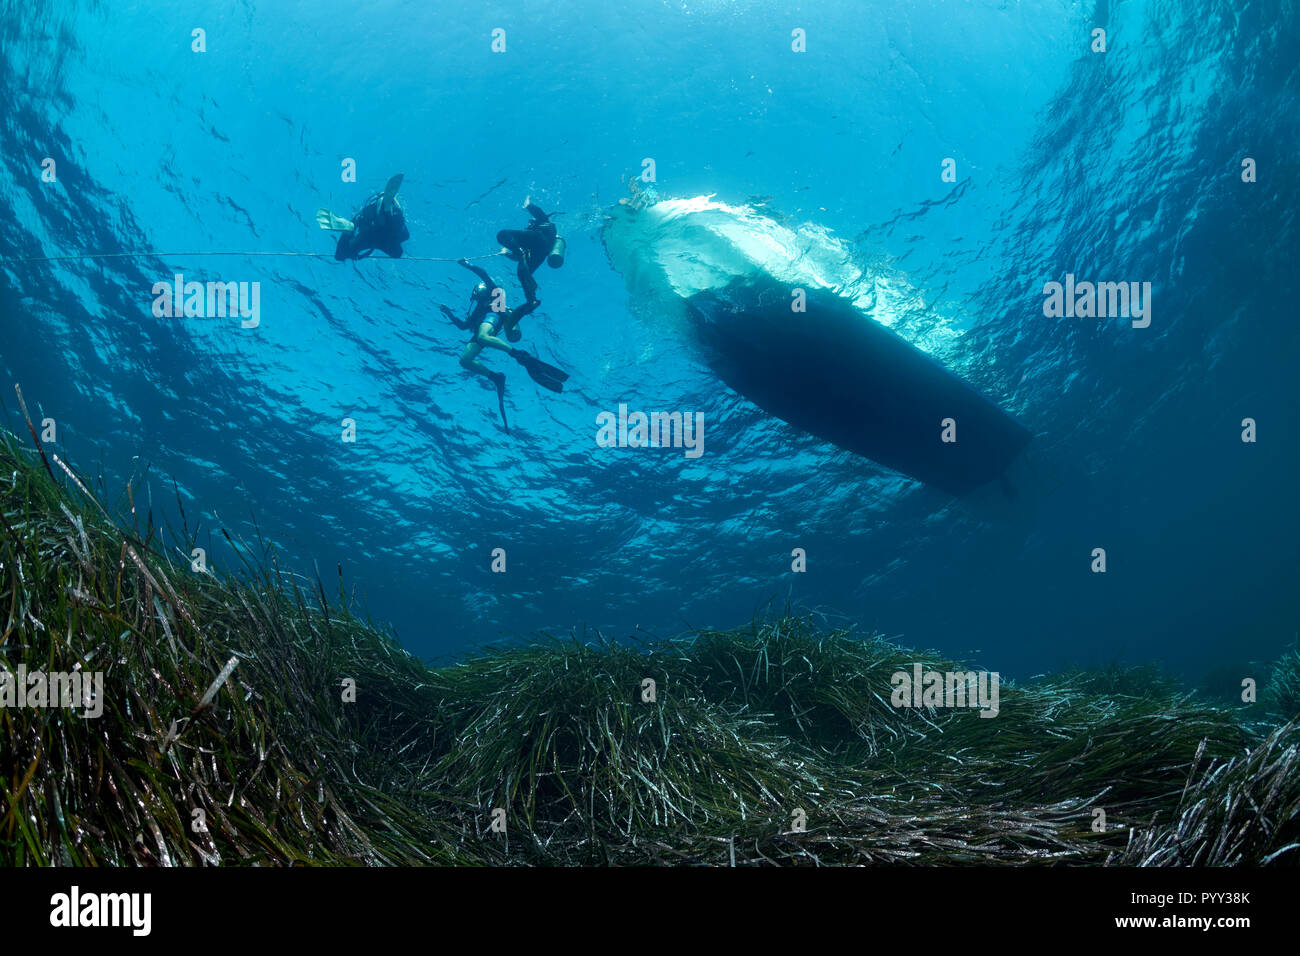 Divers sur corde, bateau de plongée, Neptune Grass (Posidonia oceanica), mer Méditerranée, Côte sud de Chypre, Chypre Photo Stock